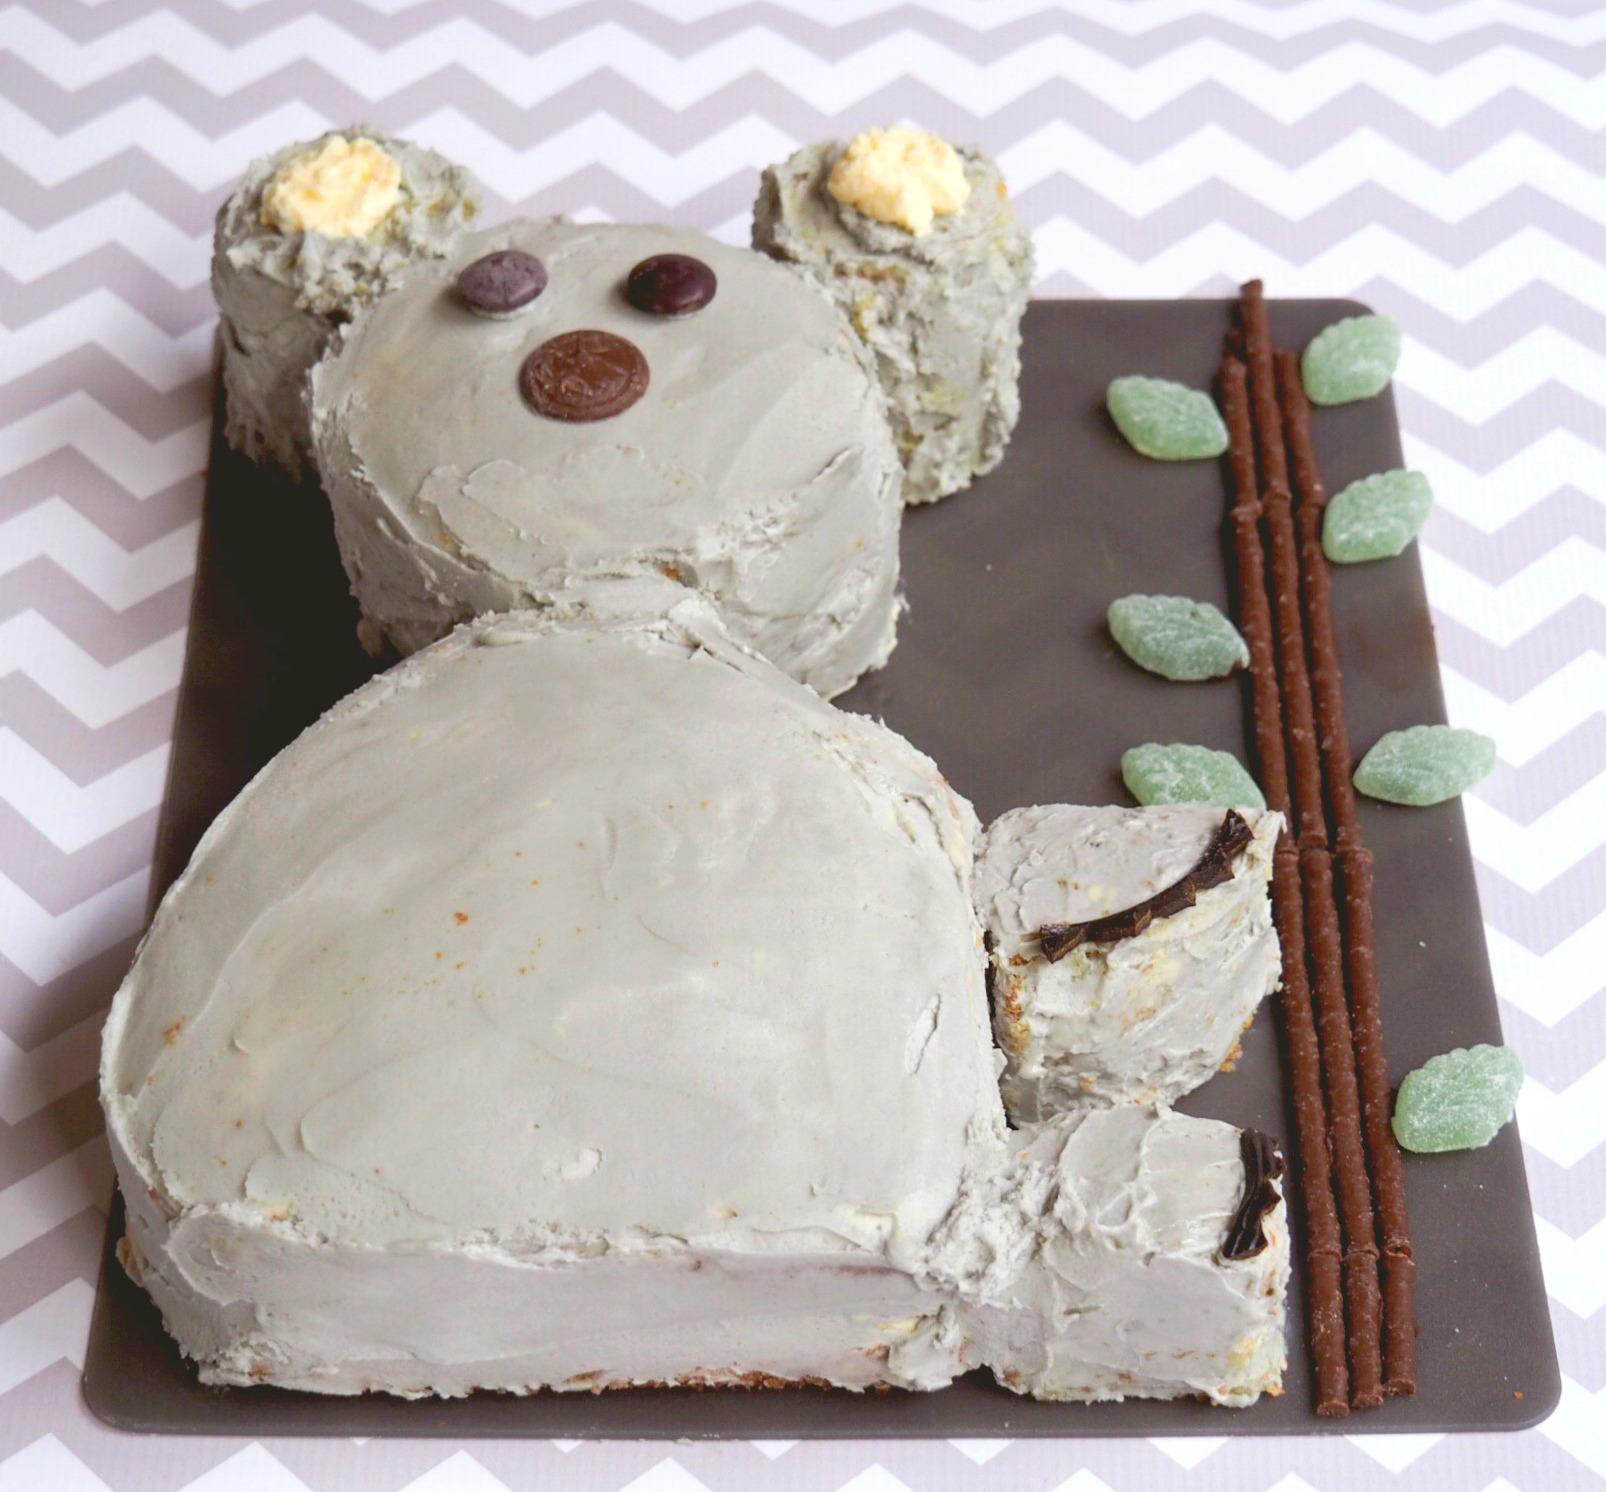 How to make a koala cake 2